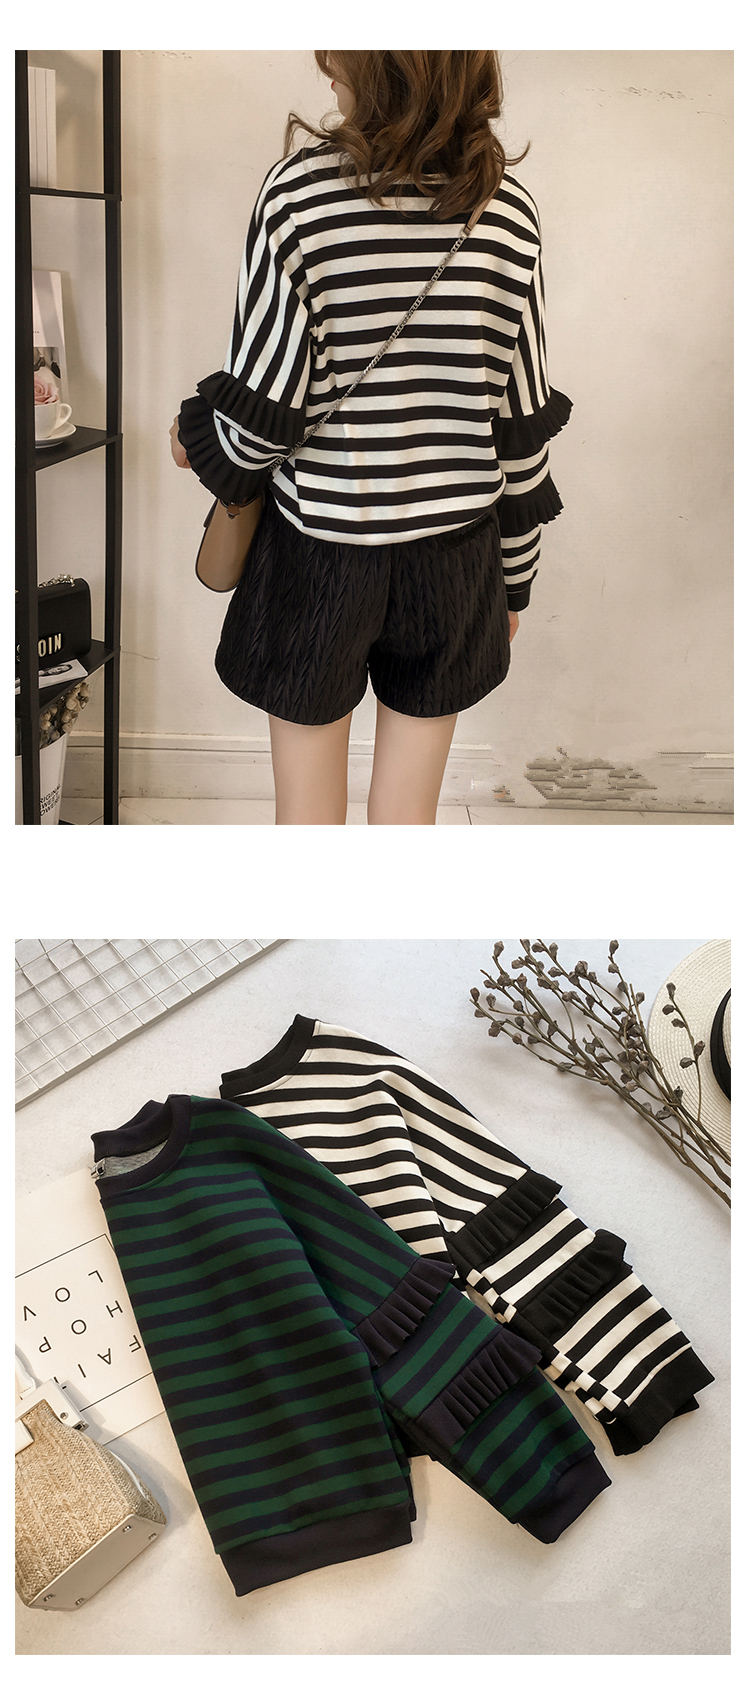 M-4xl Striped Sweatshirt Pullovers Women Plus Size Spring Autumn Ruffles Long Sleeve Tops Casual Harajuku Feminino White Green 14